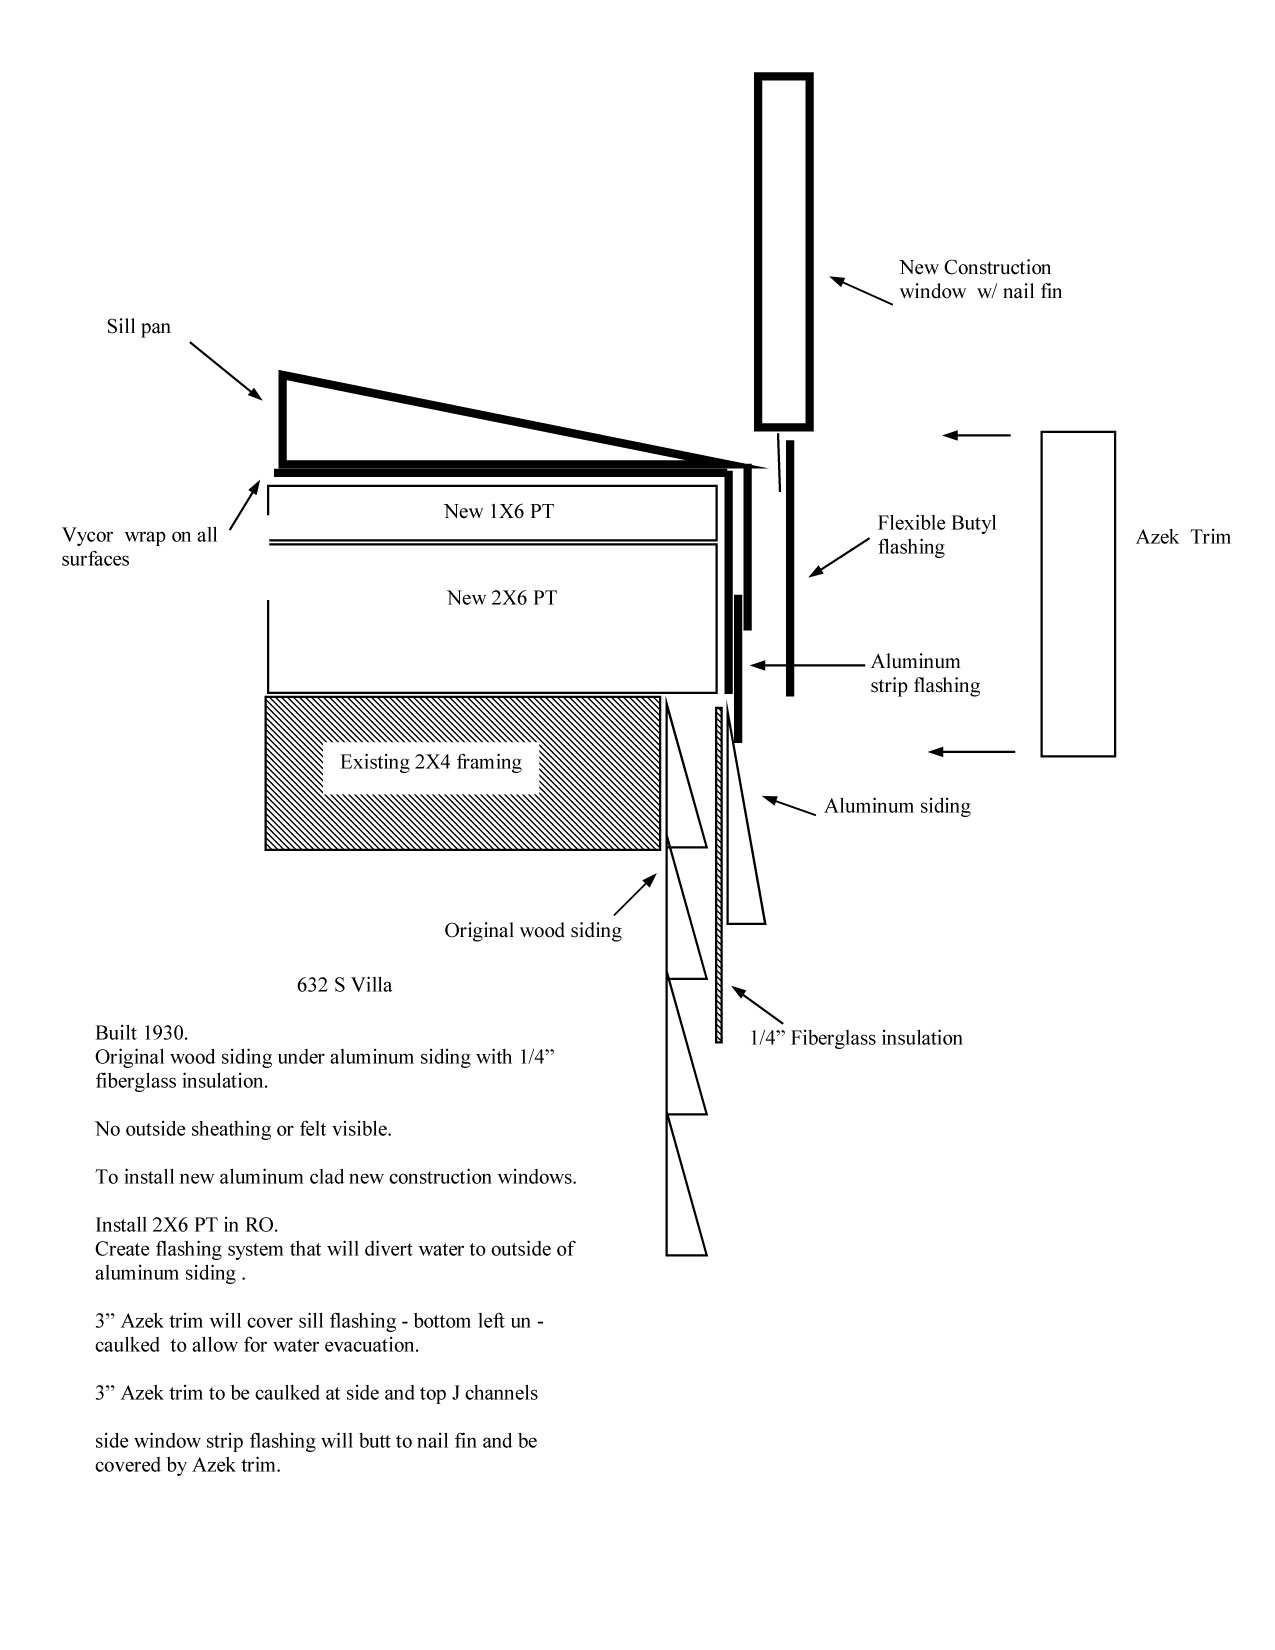 Bungalow Replacement Windows Installation Details Part 2